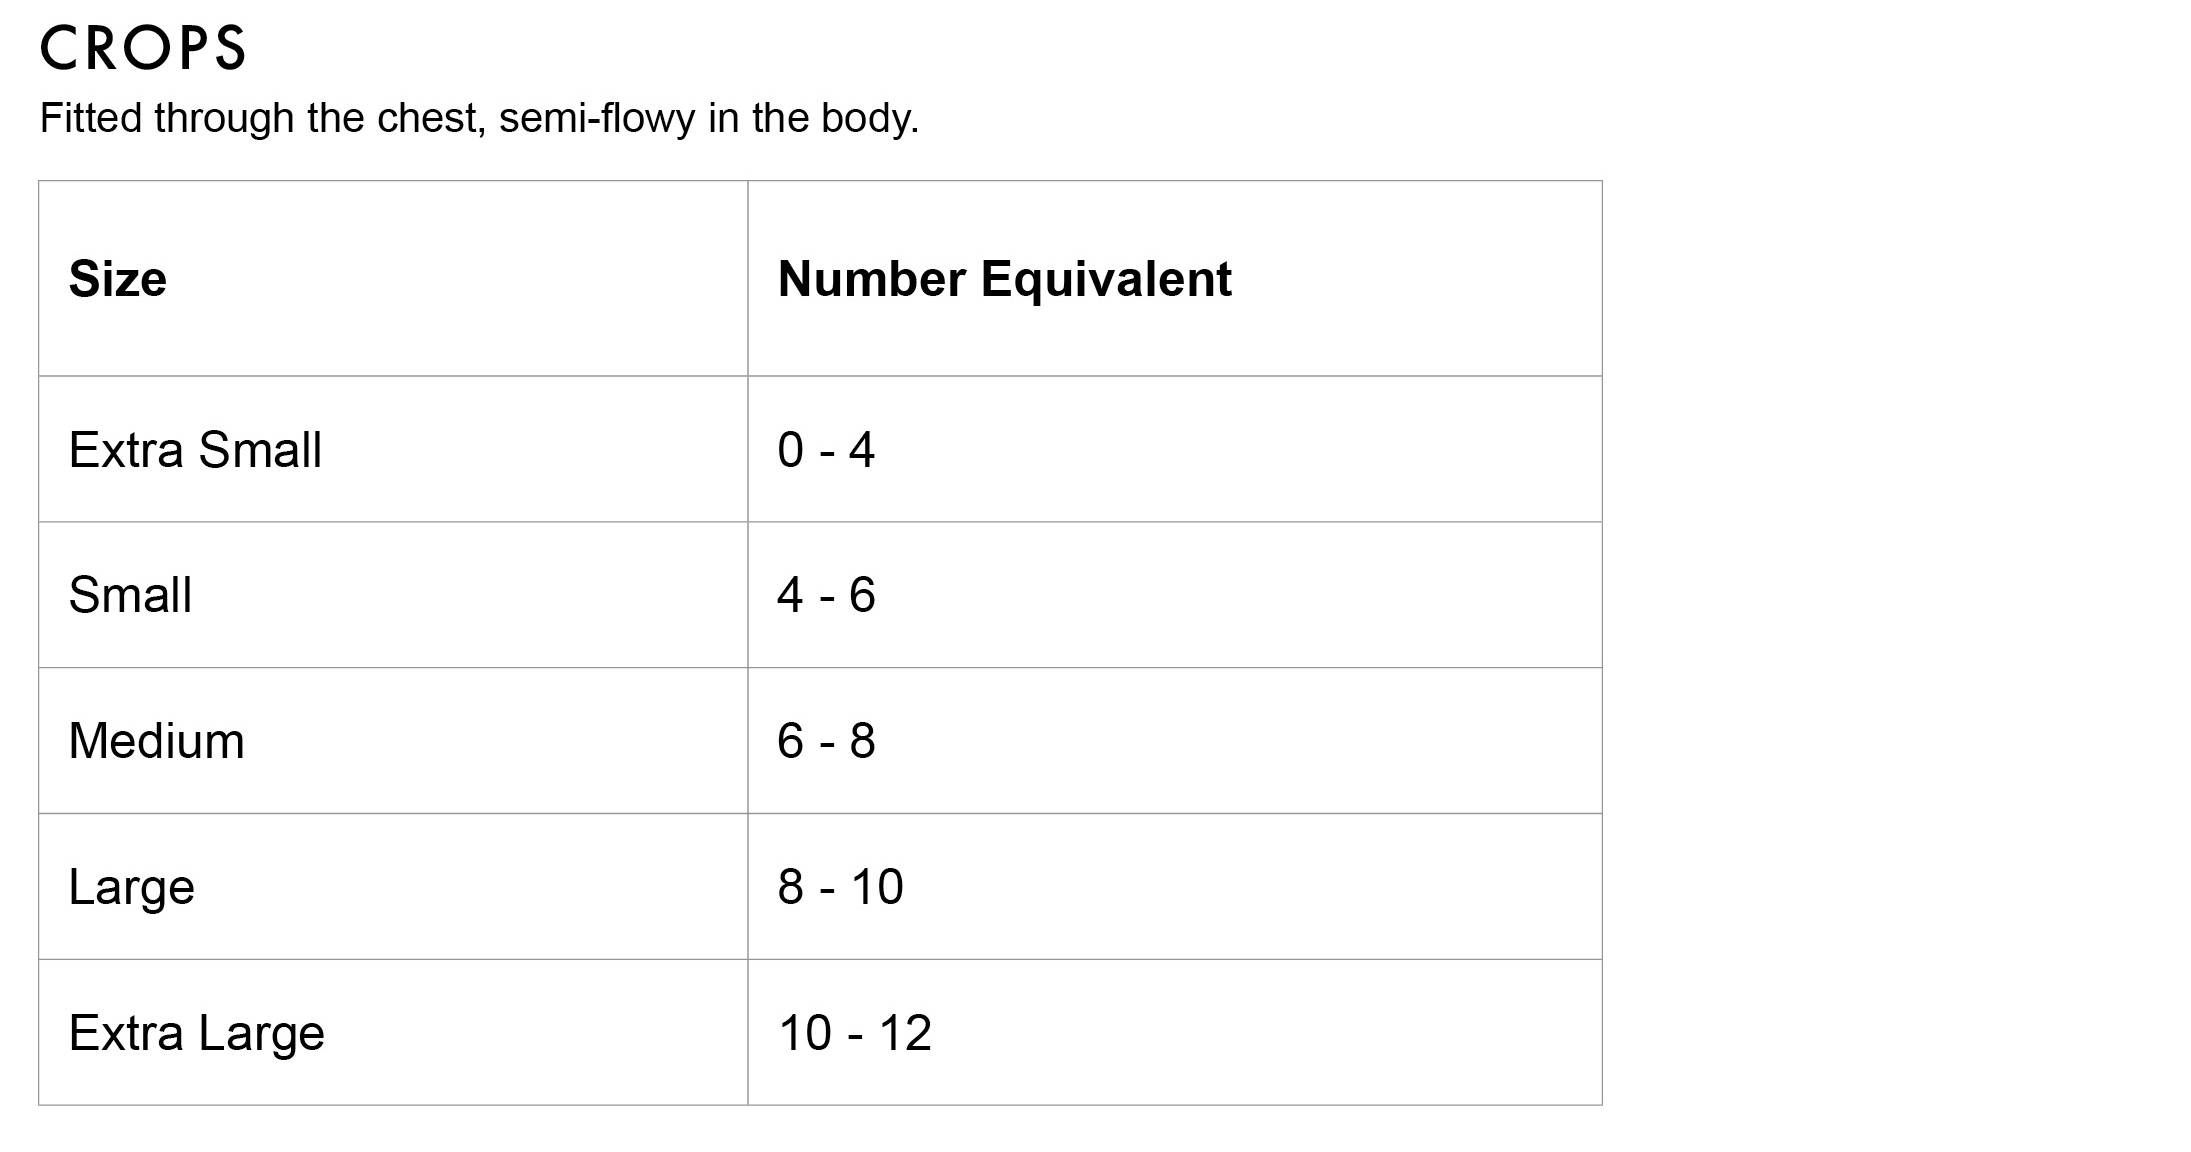 FLEO Crop Size Chart